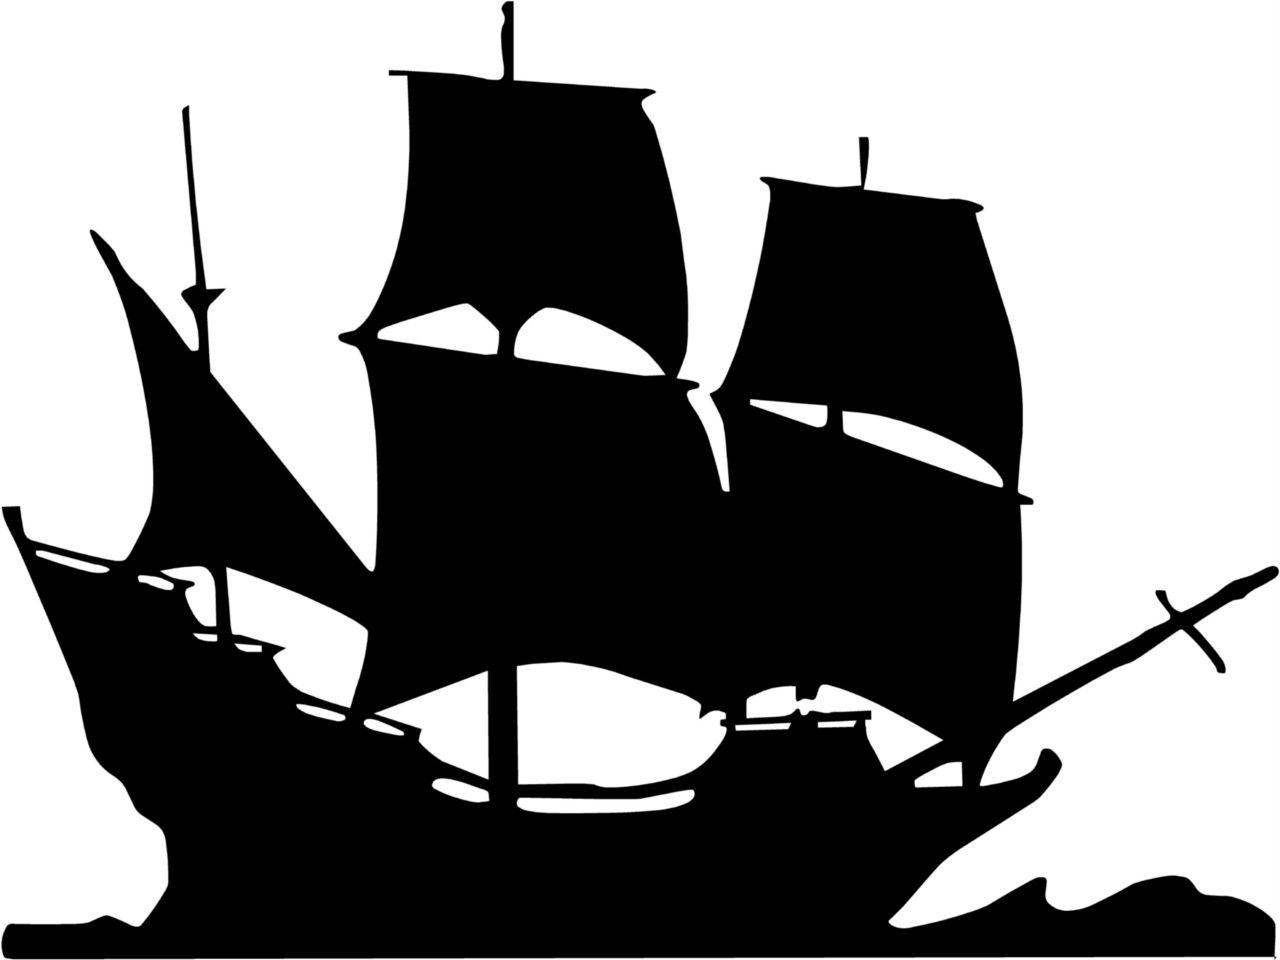 Pirate Ship Vinyl Wall Art Decal Sticker Boy Bedroom Nursery Decor